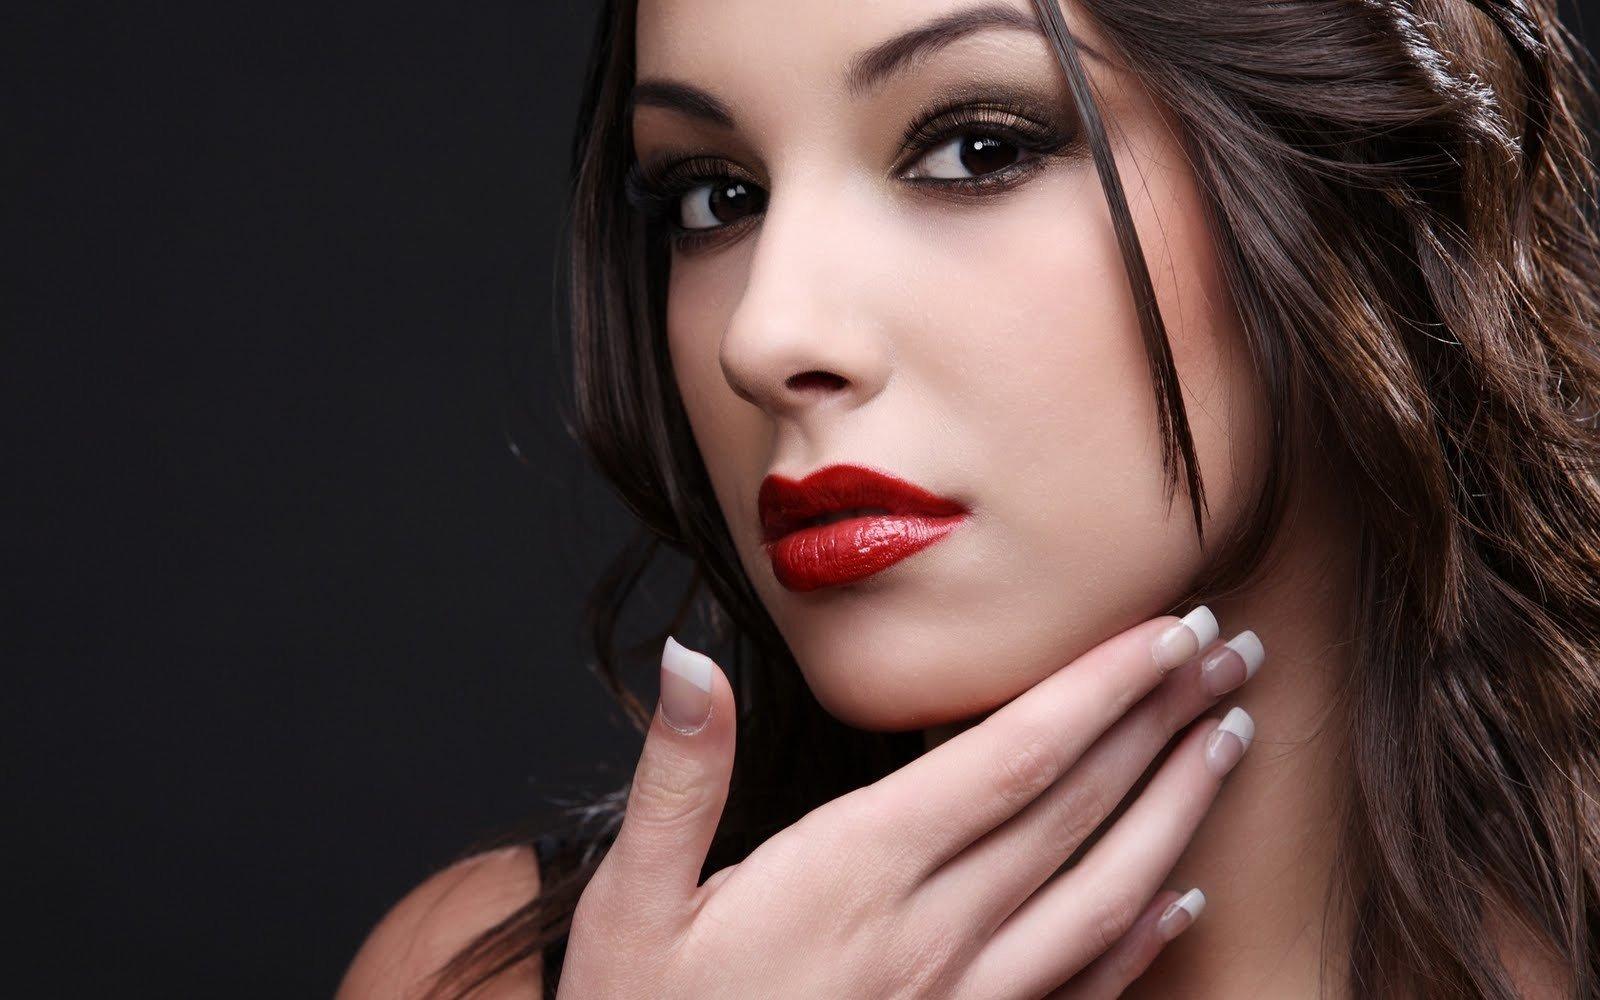 Most Beautiful Women HD Wallpaper - WallpaperSafari